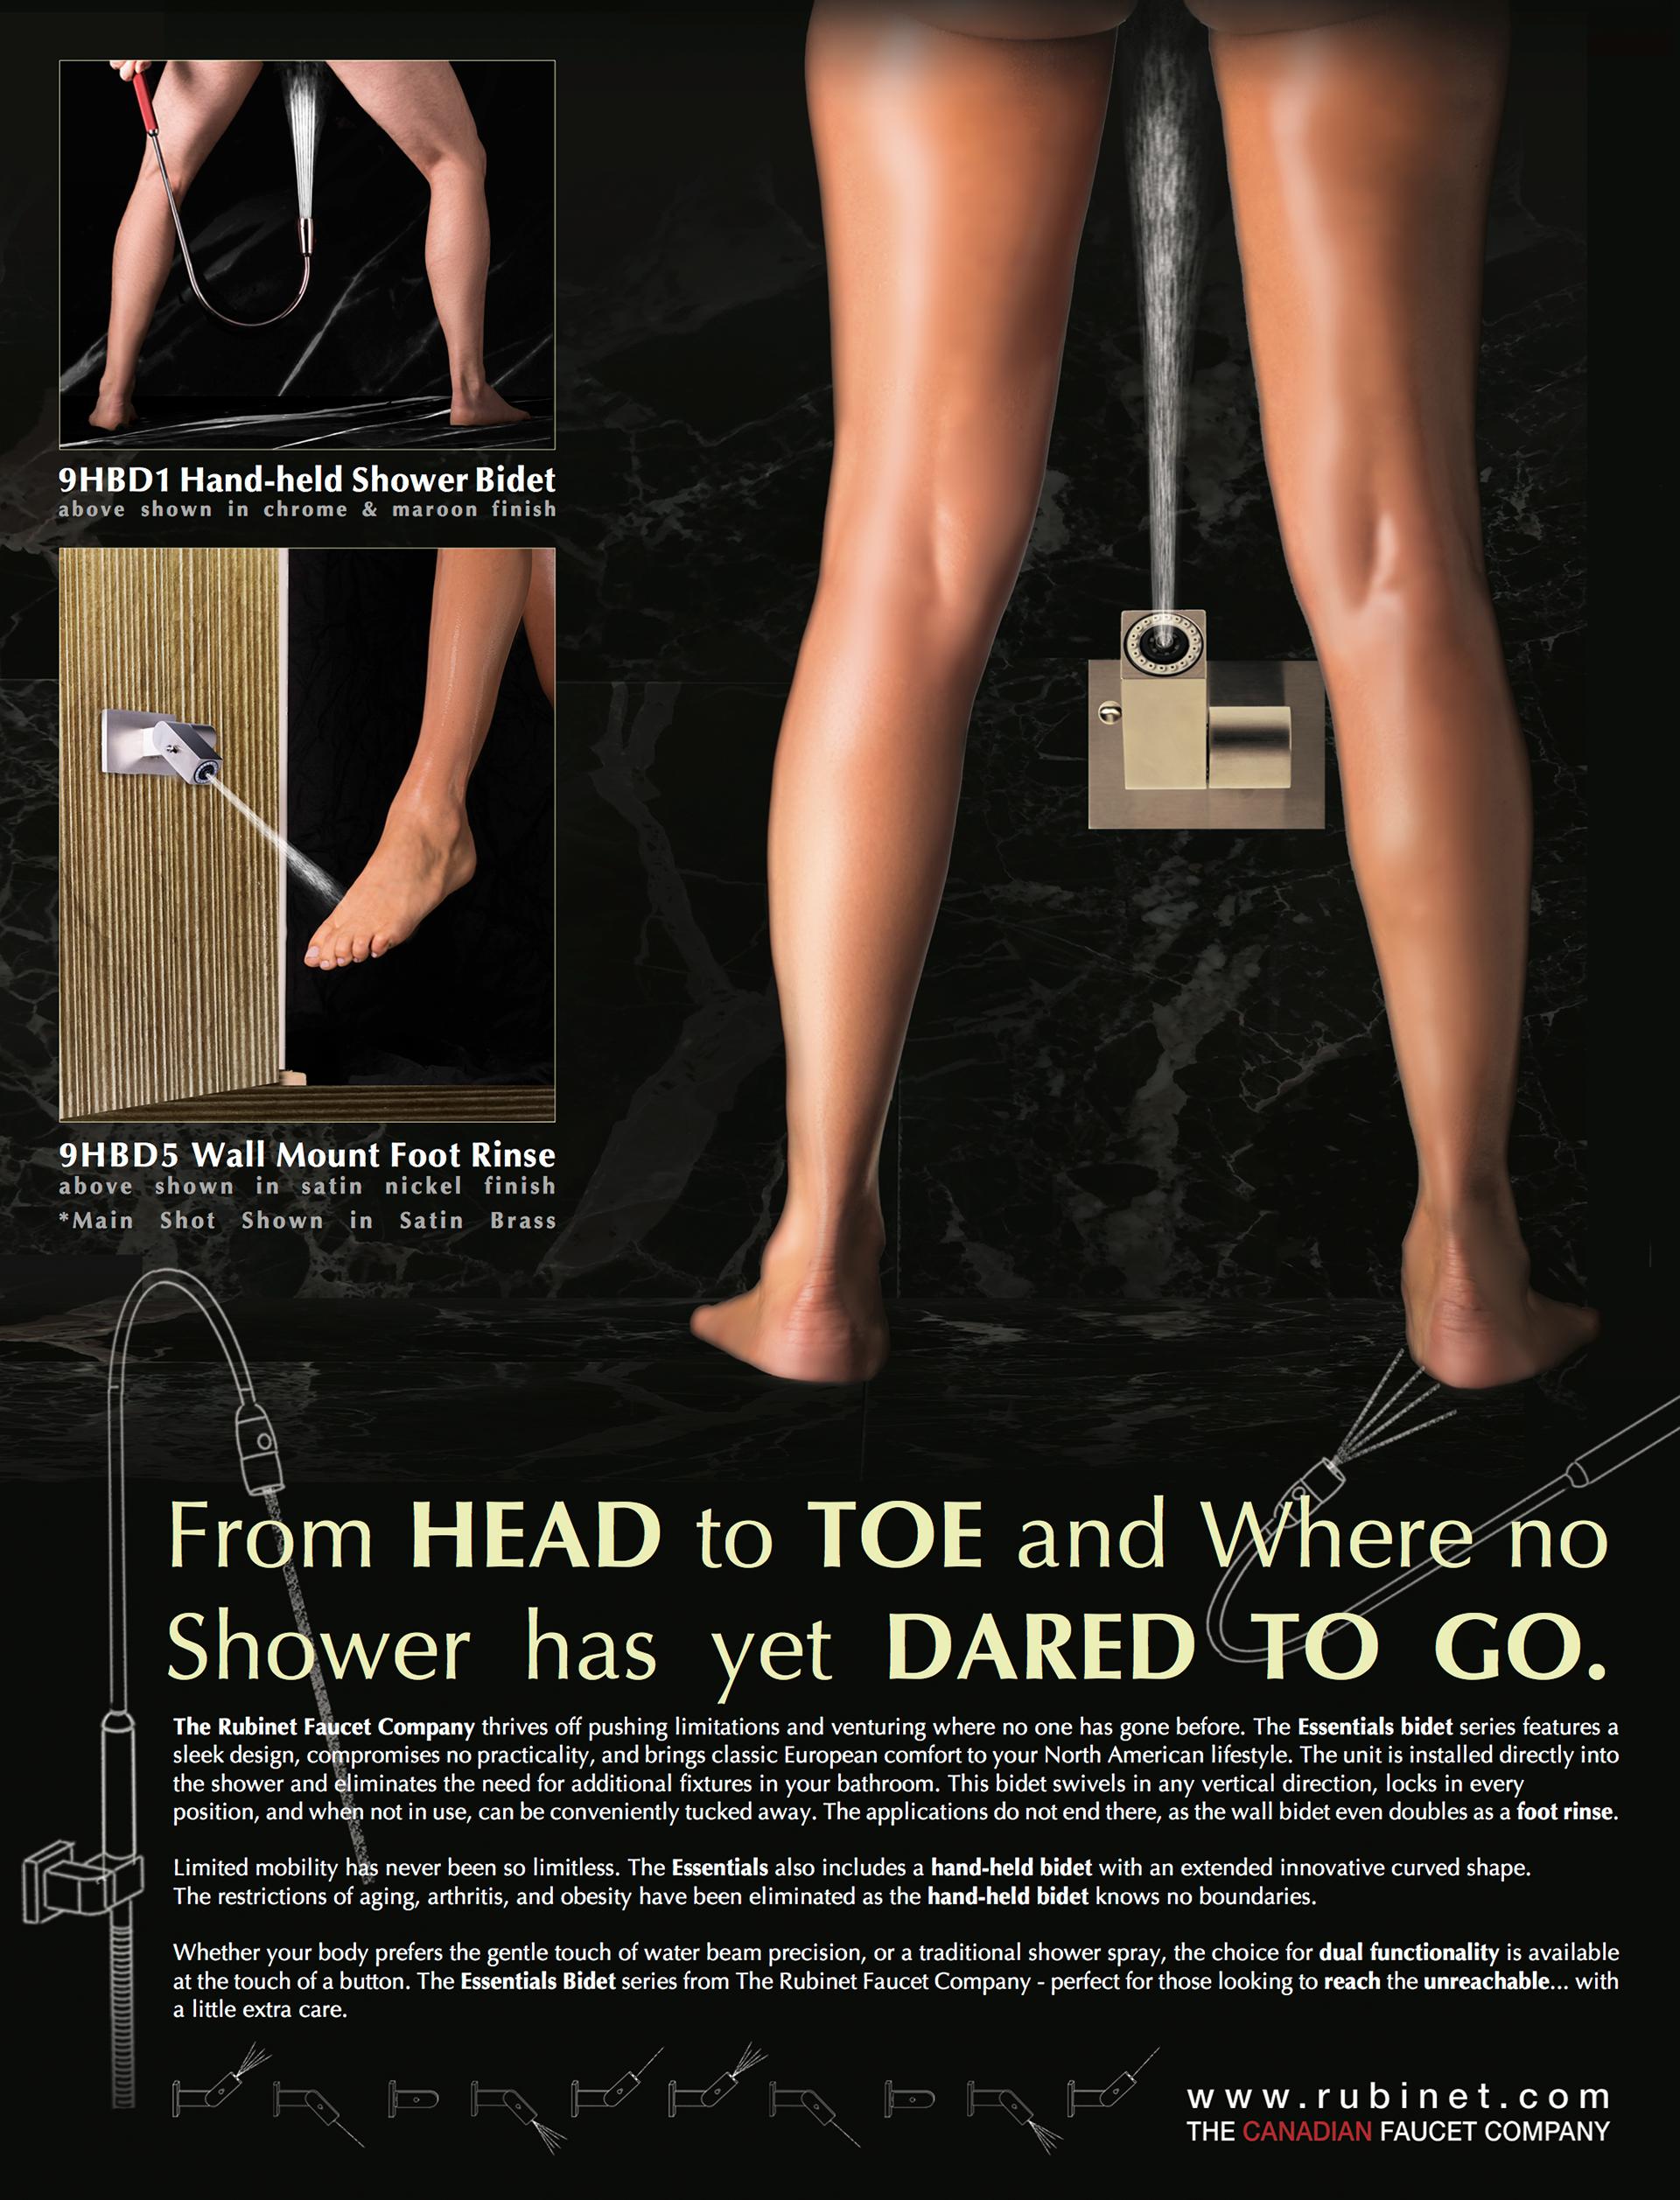 Maddy Turk - Essentials Wall Bidet Ad